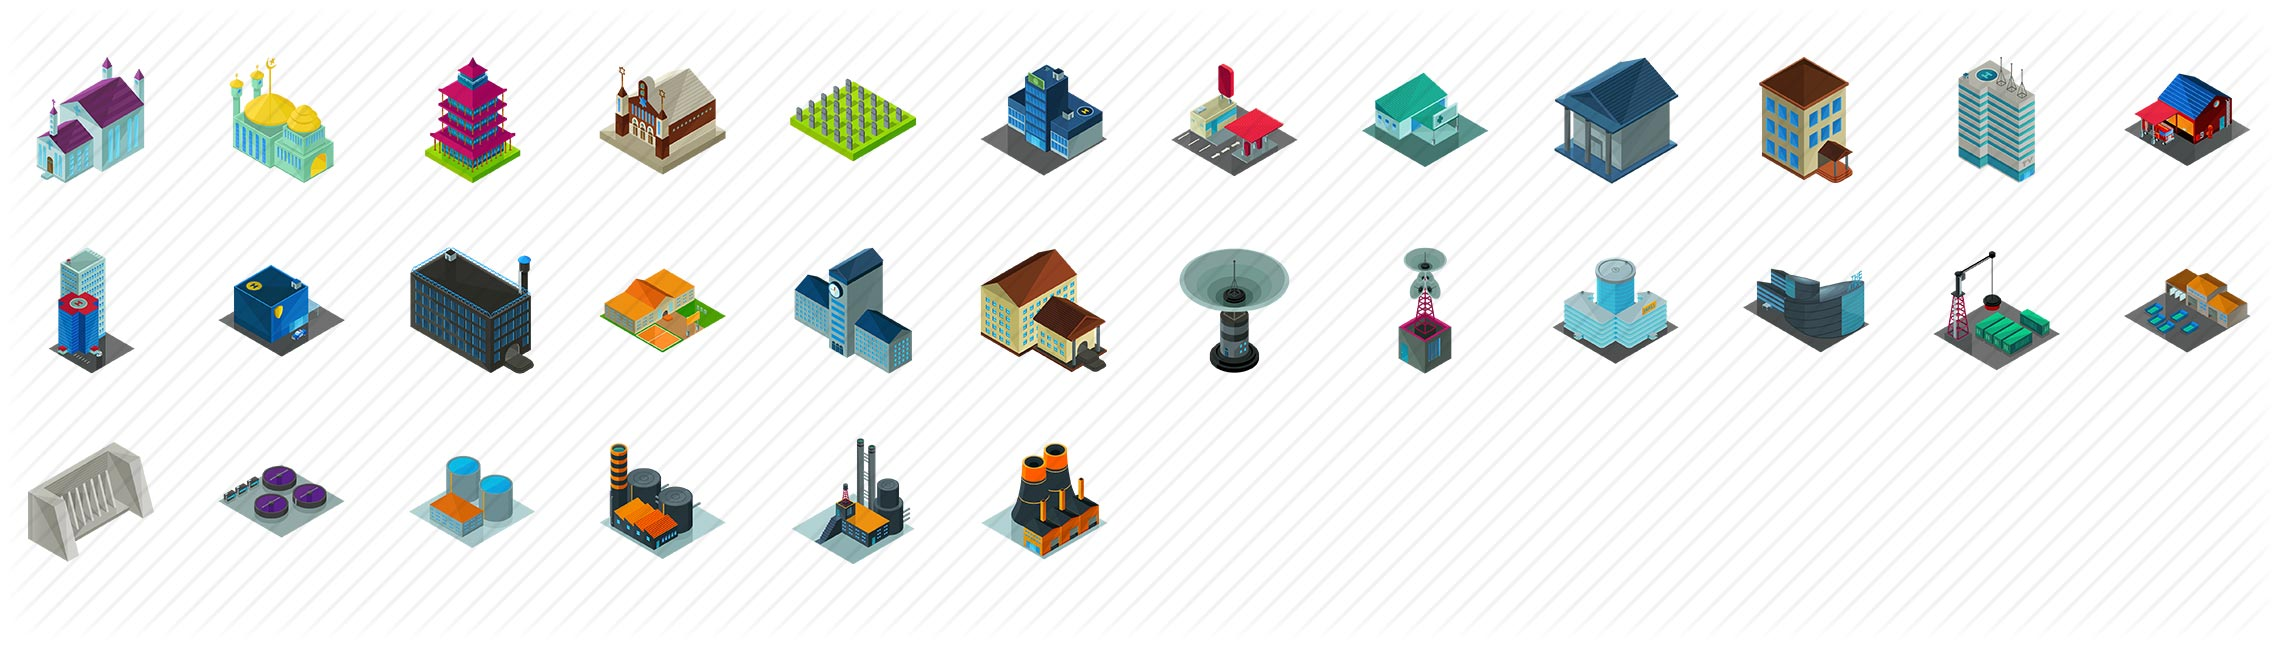 Essential Buildings Isometric Icons